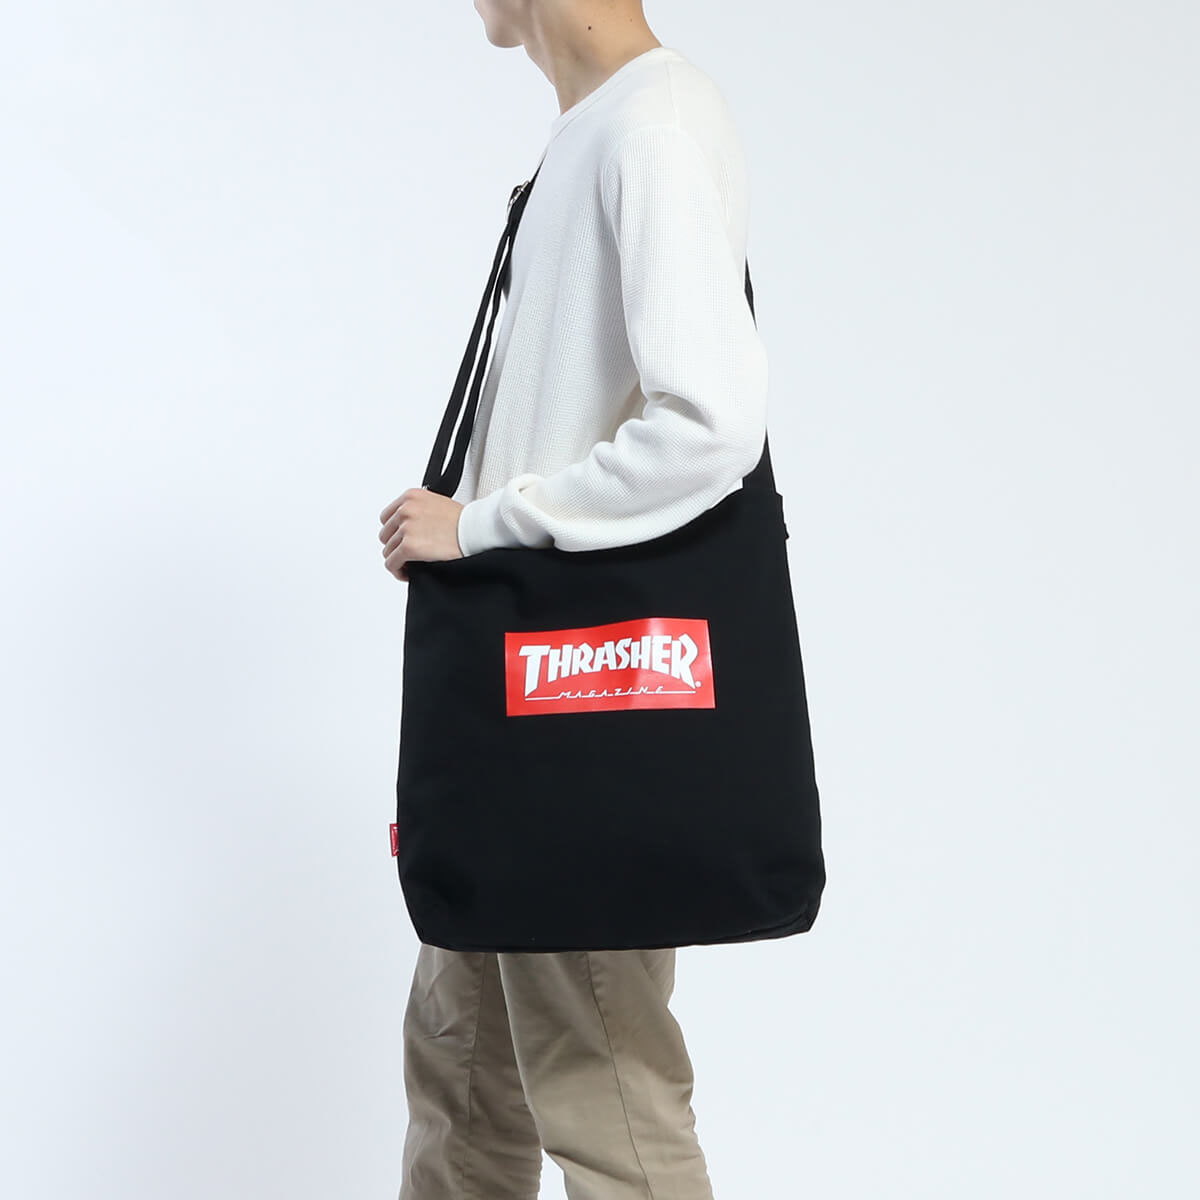 Thrasher Print Tote Shoulder Bag 2 Way B 4 Vertical School High Men S Women Thc 803